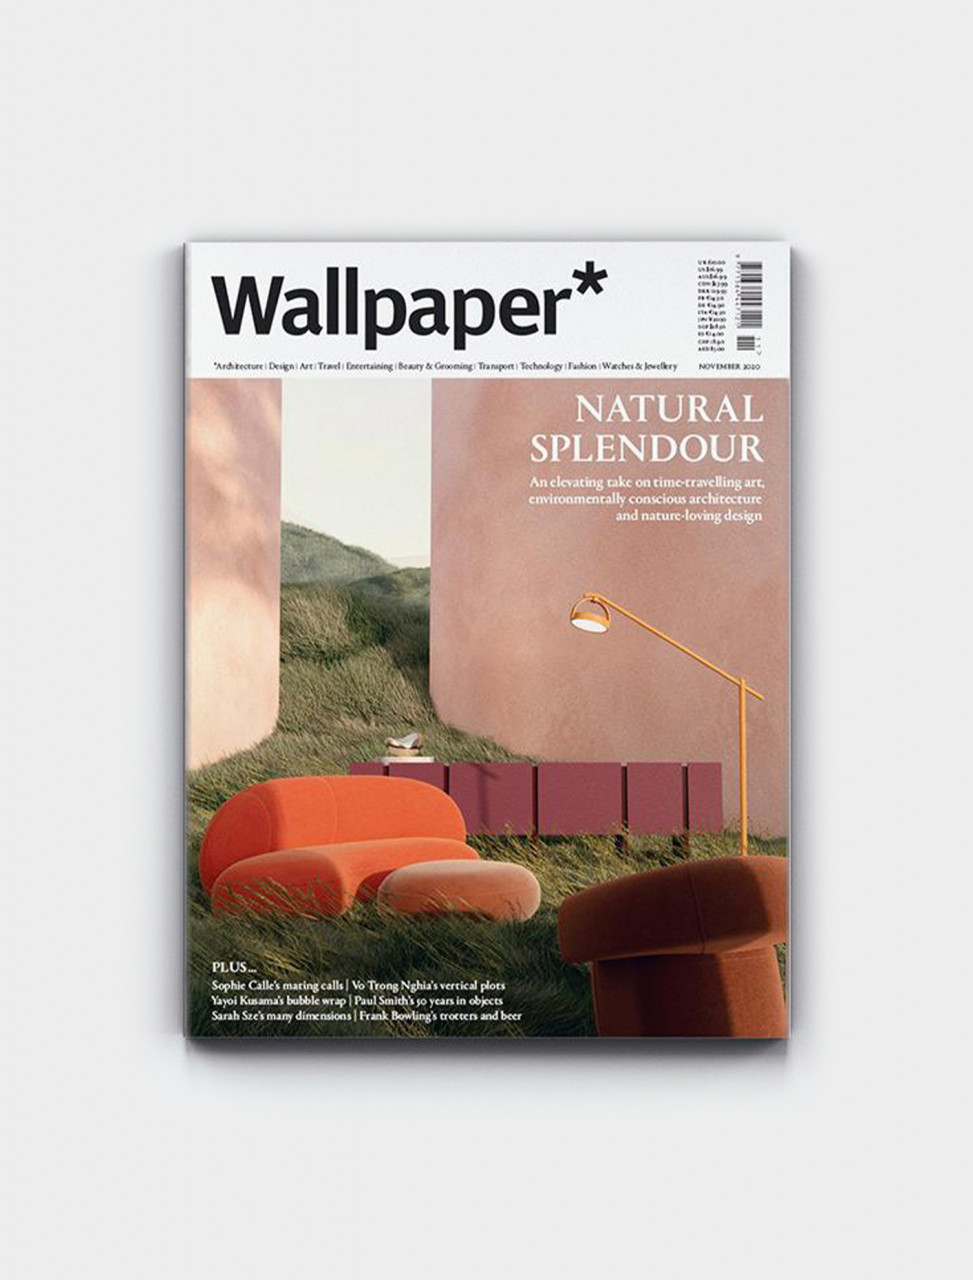 977136444712111 WALLPAPER* NOVEMBER 2020